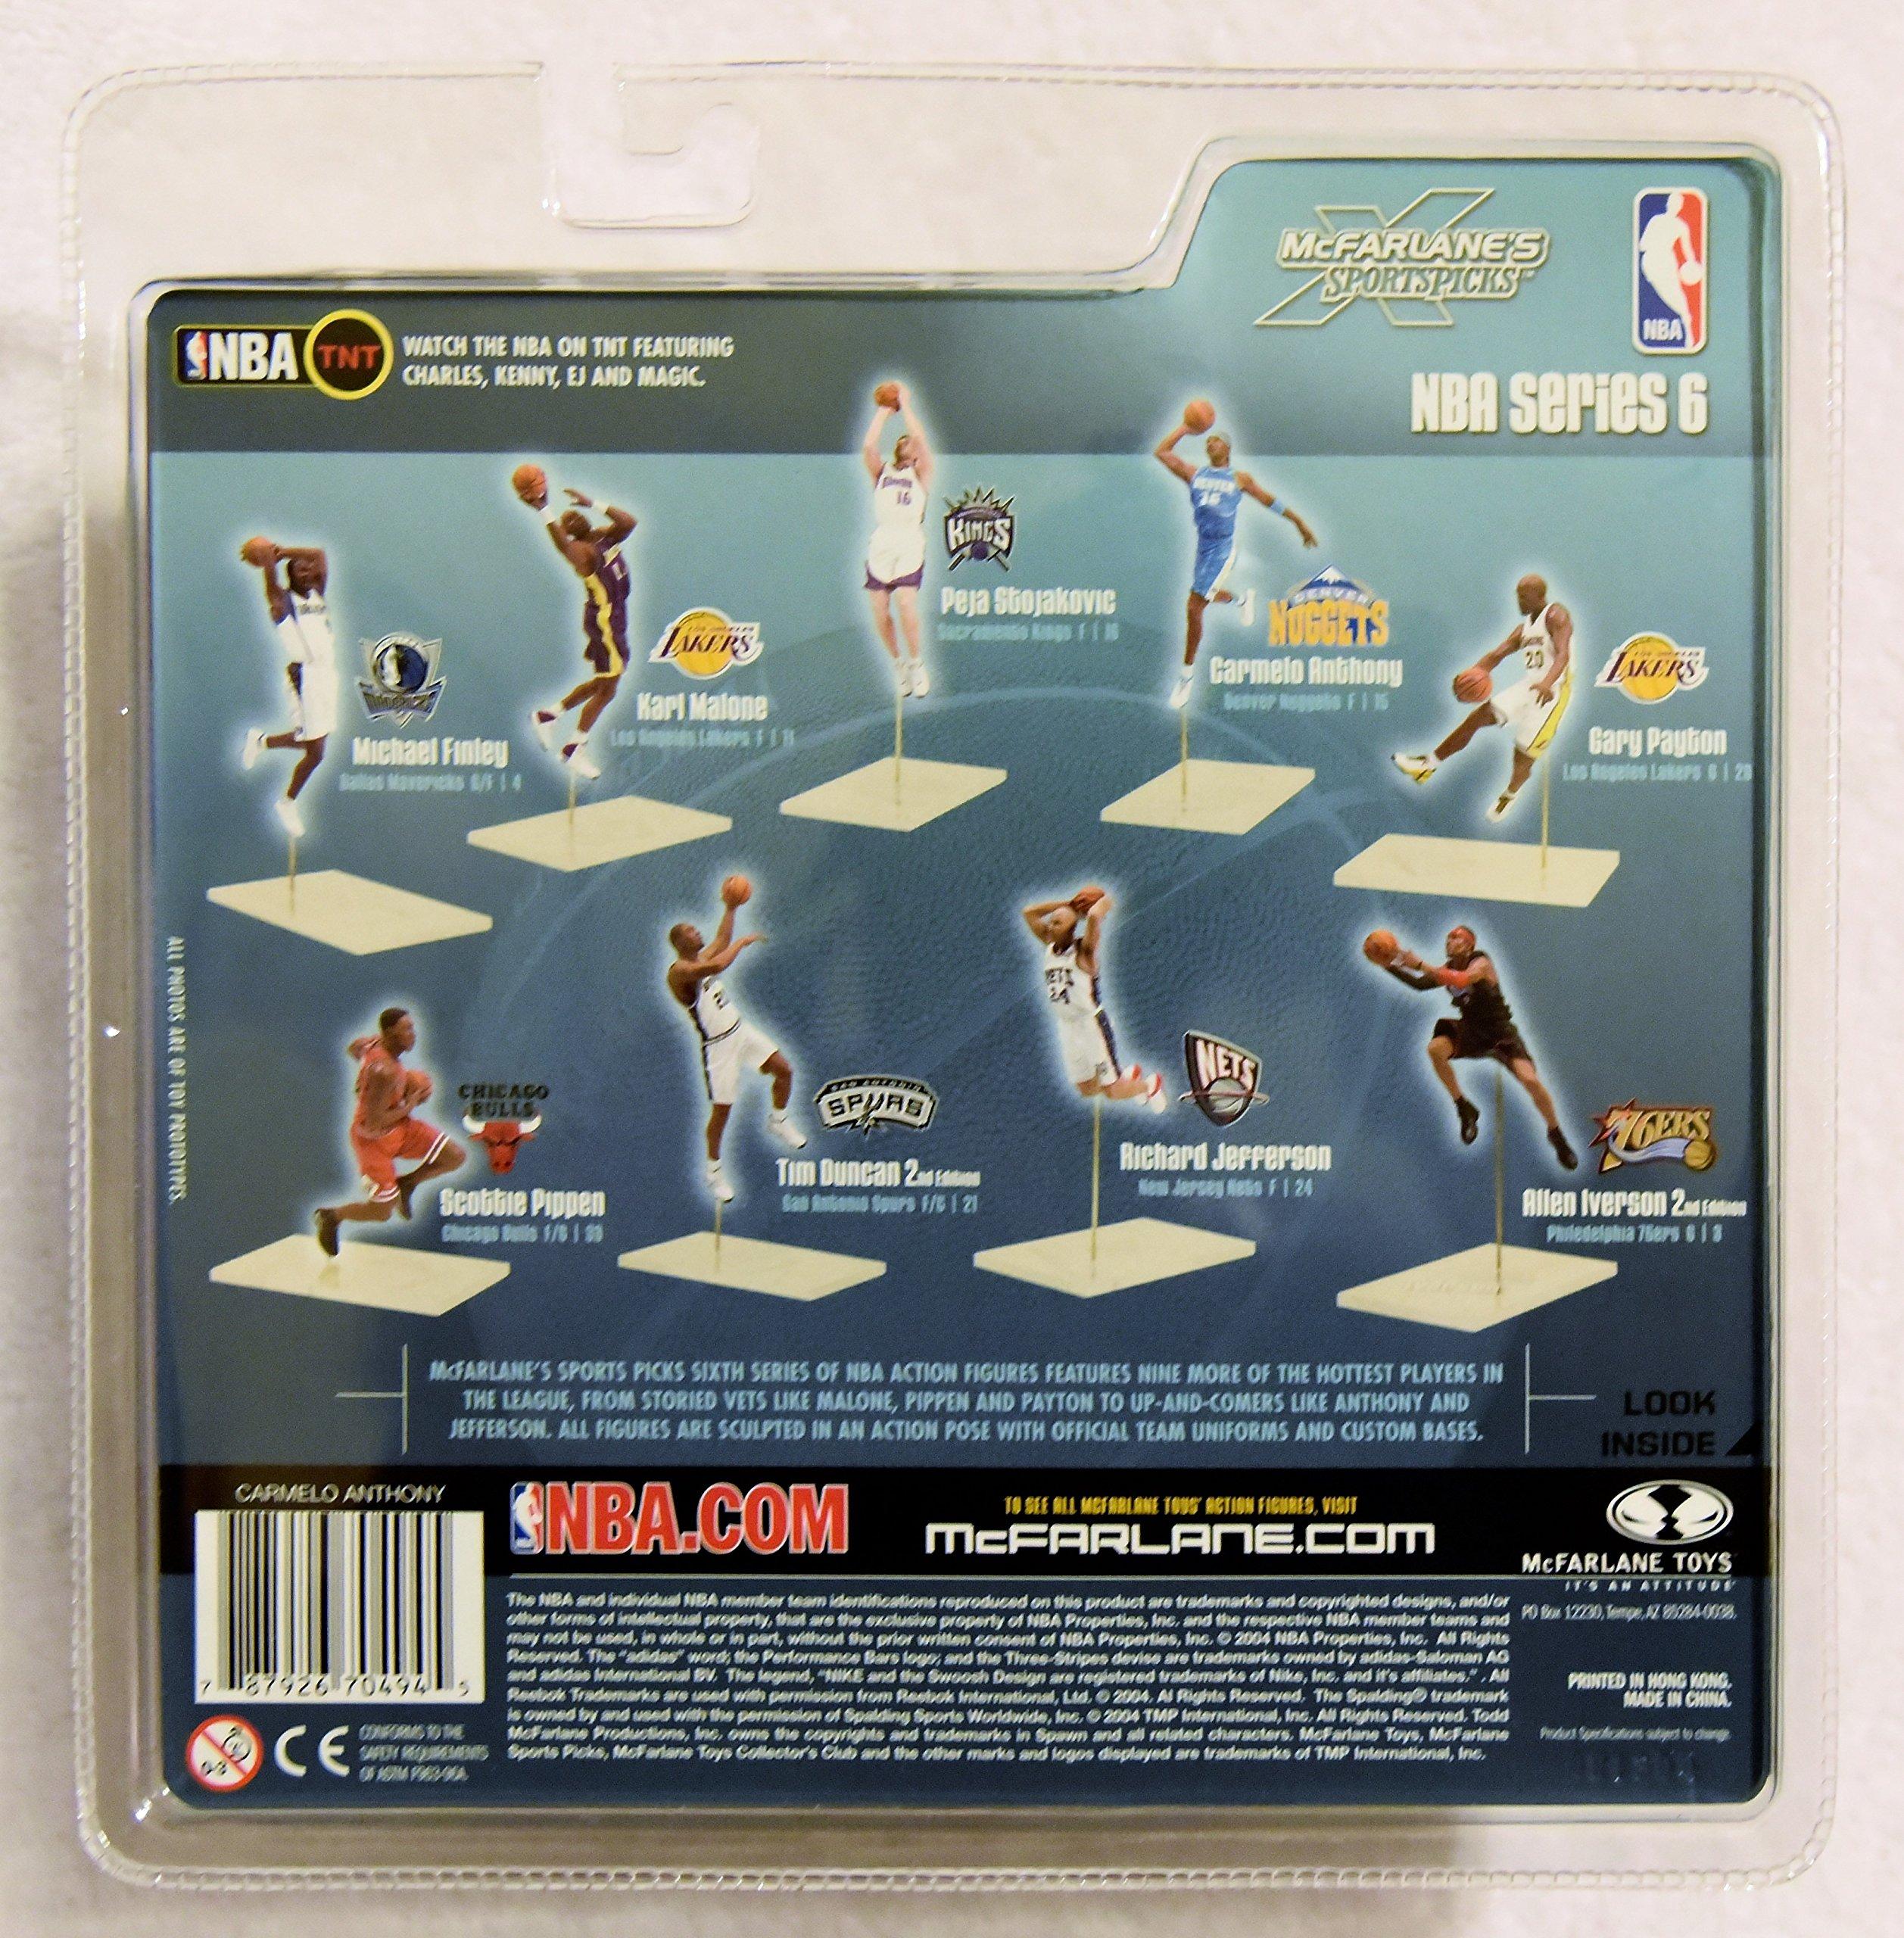 McFARLANE 2004 McFarlane's Sportpicks CARMELO ANTHONY Basketball Series 6